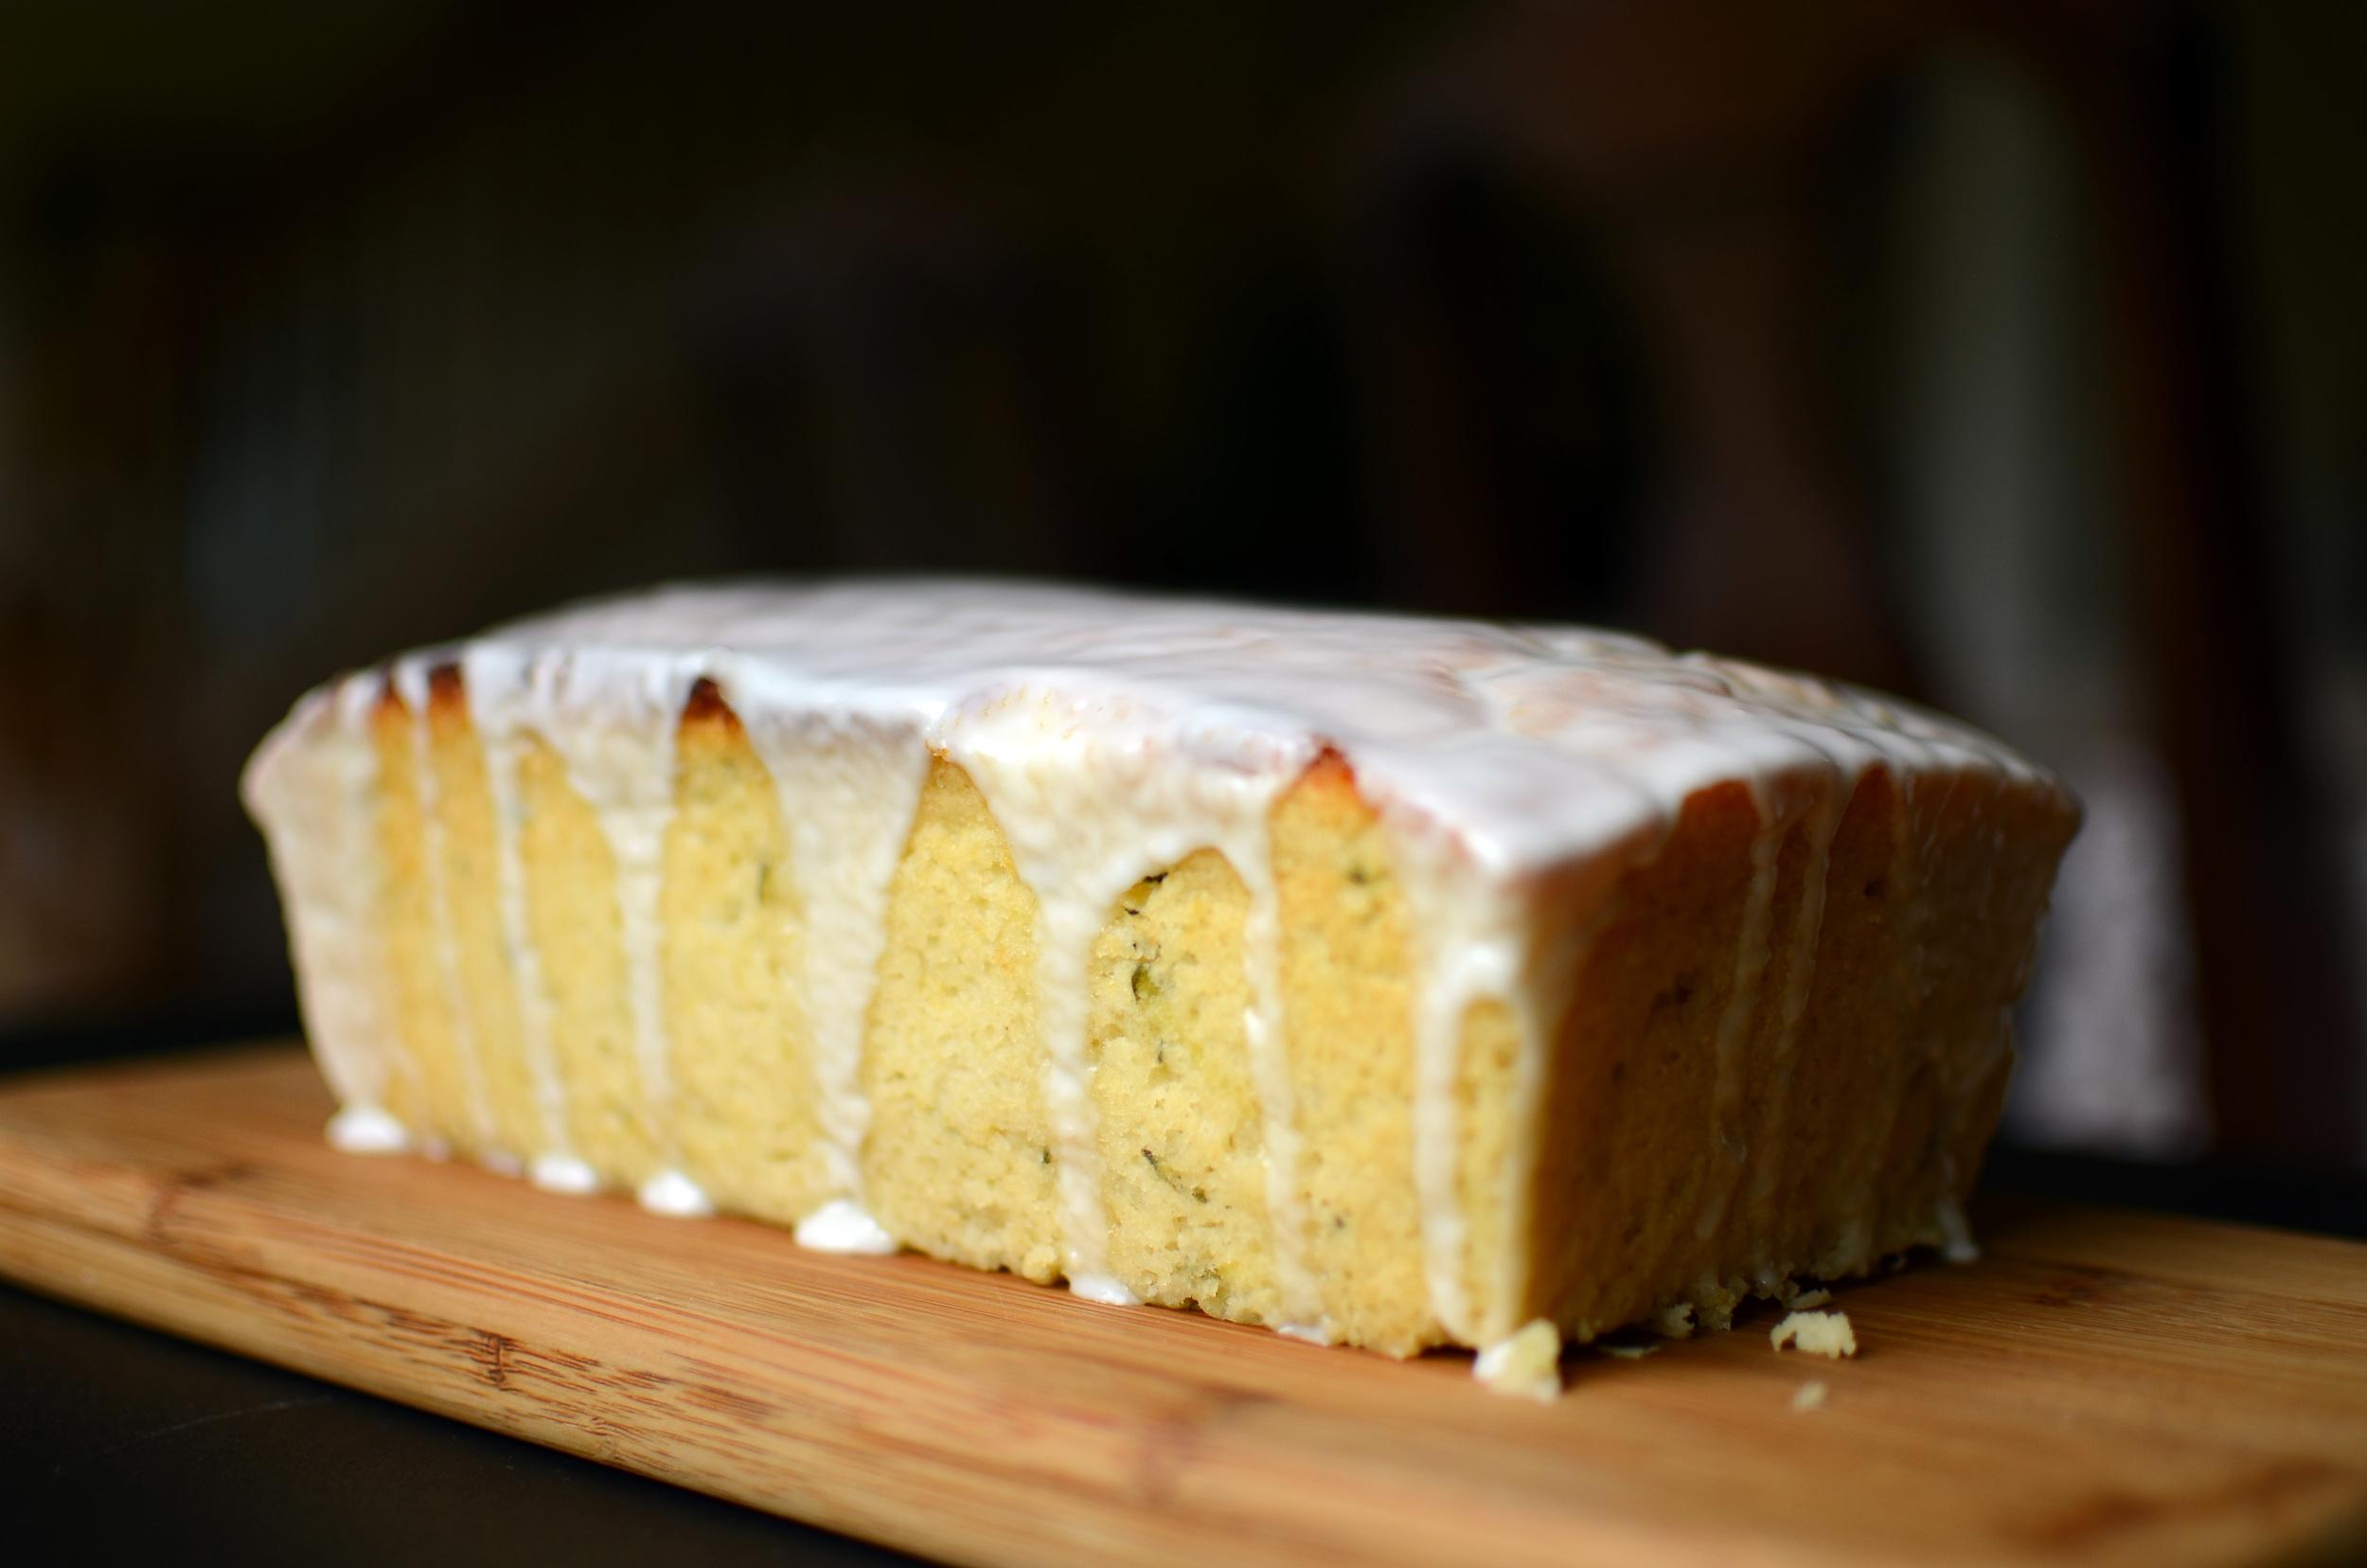 Glazed Lemon Zucchini Bread - ButterYum